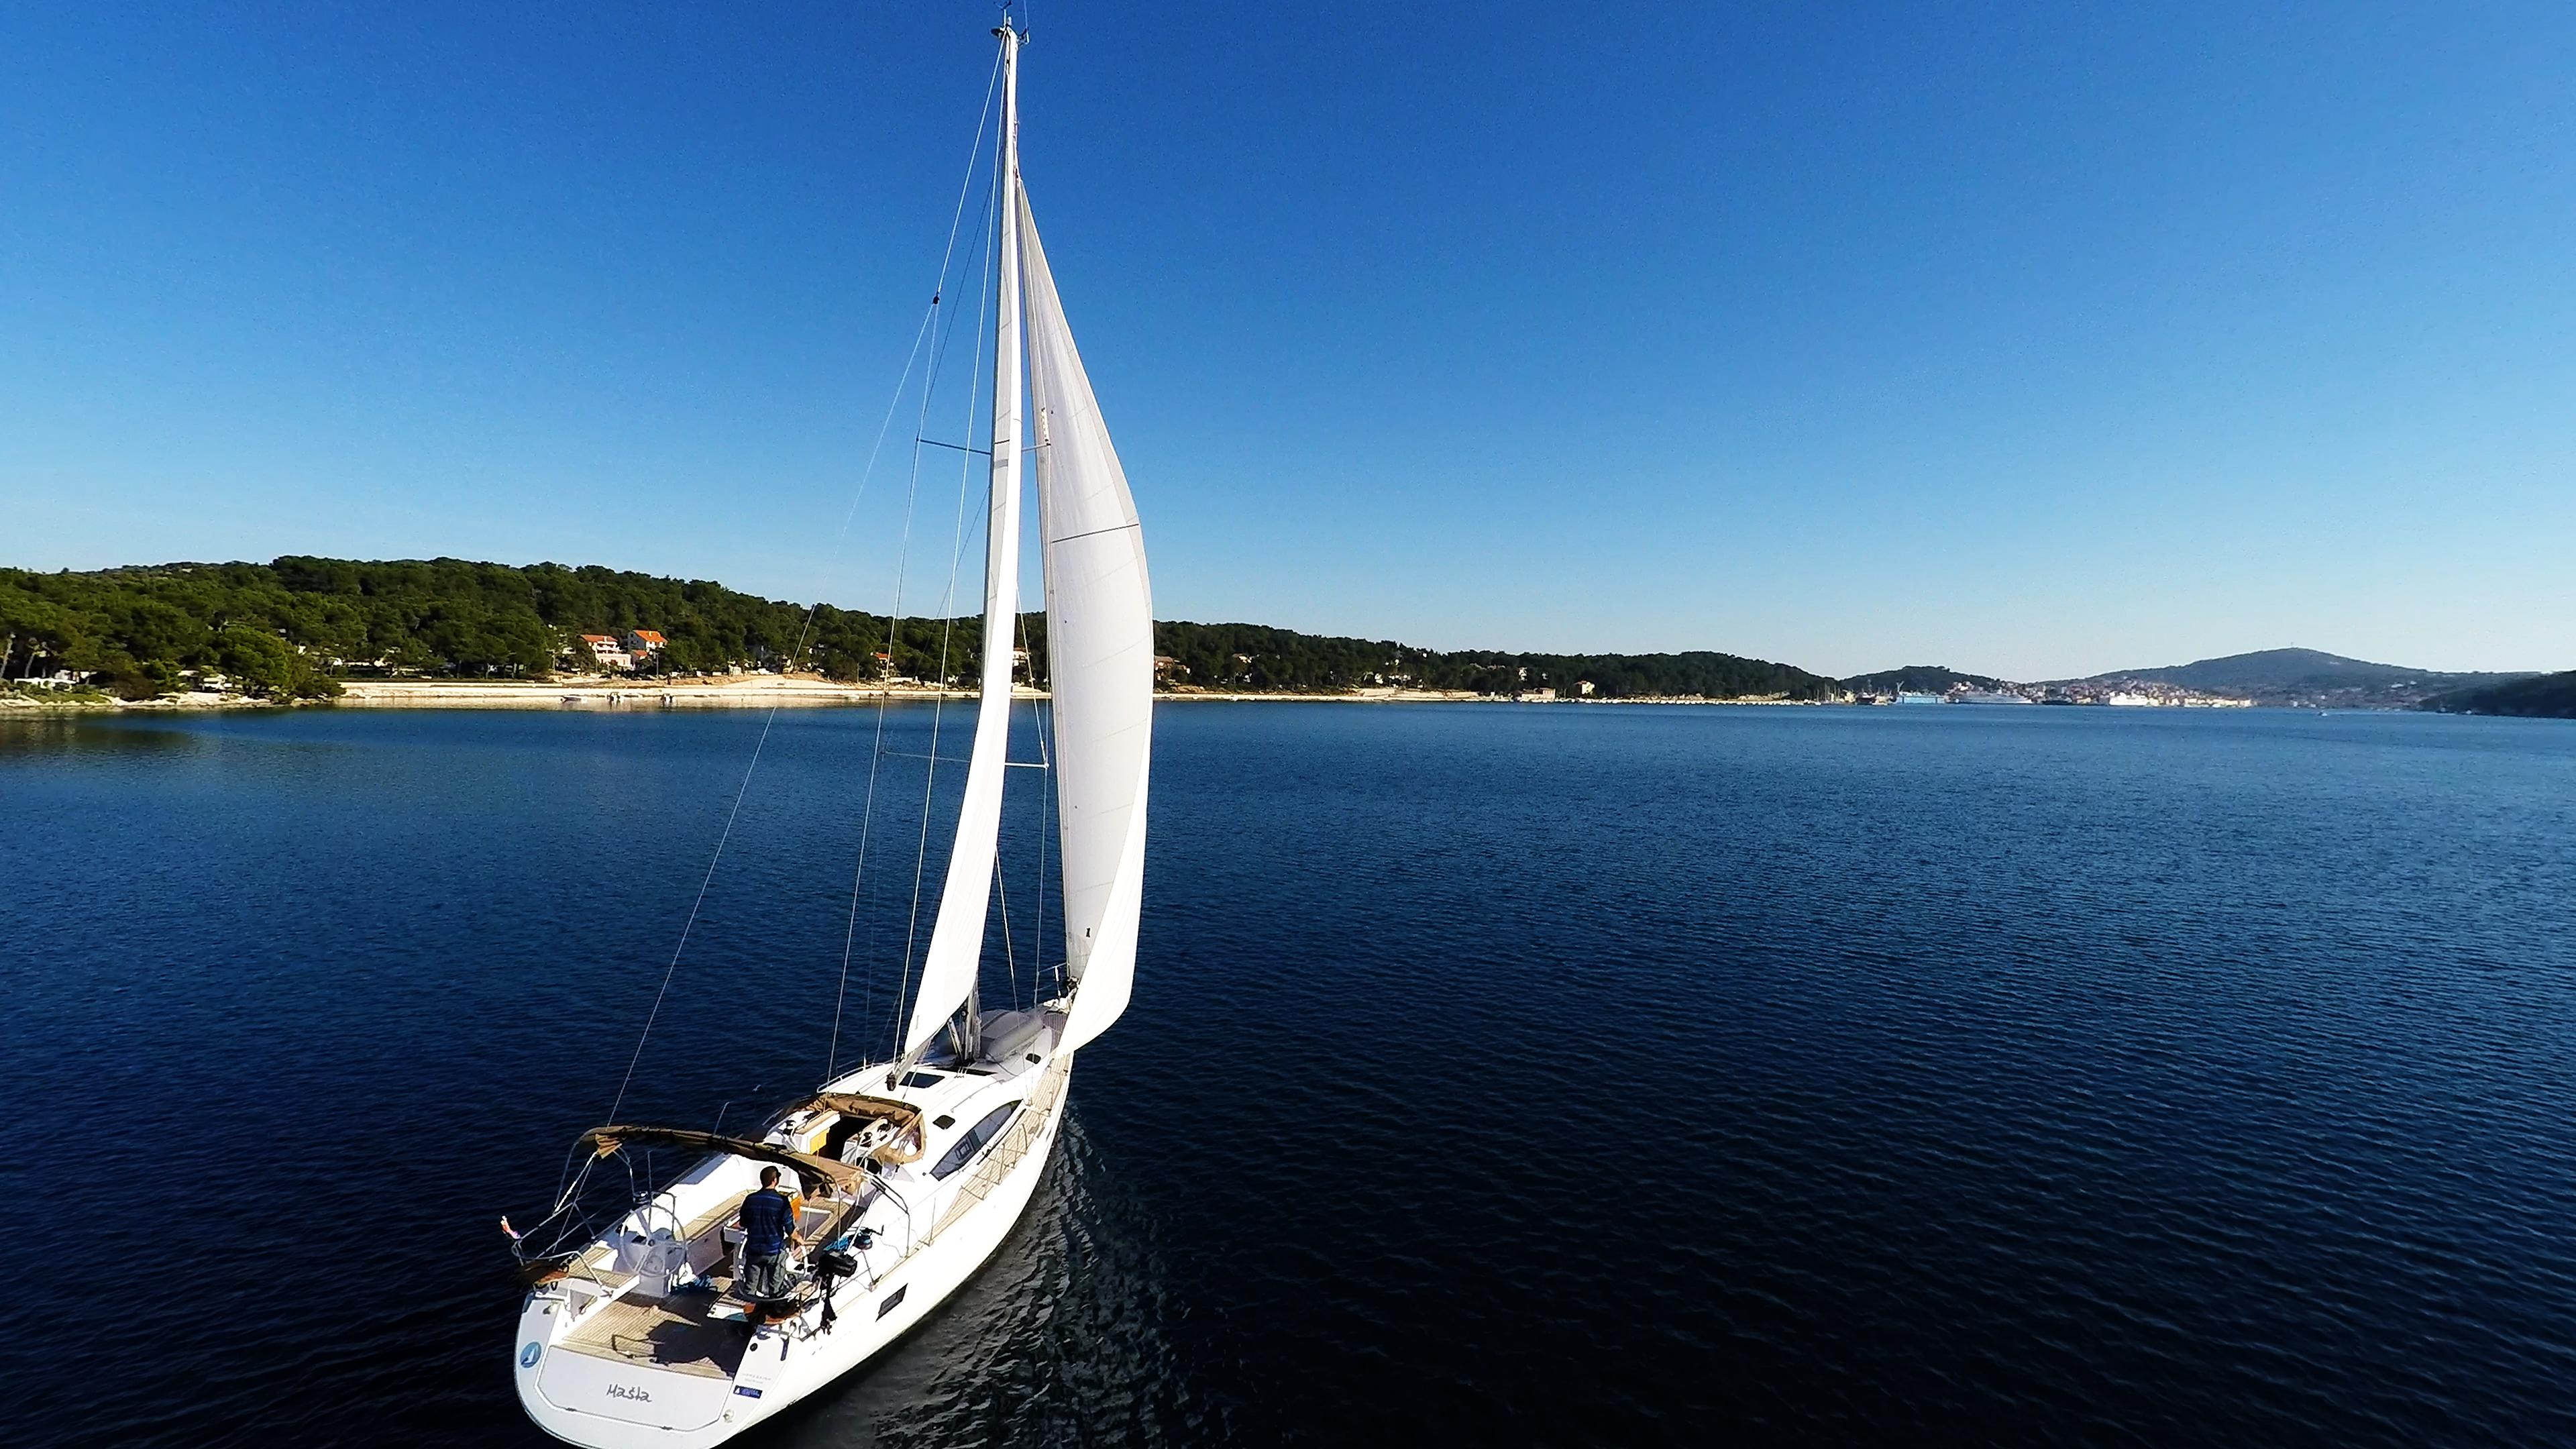 barcha a vela vele di yacht a velain baia del mare cielo blu Croazia barca a vela